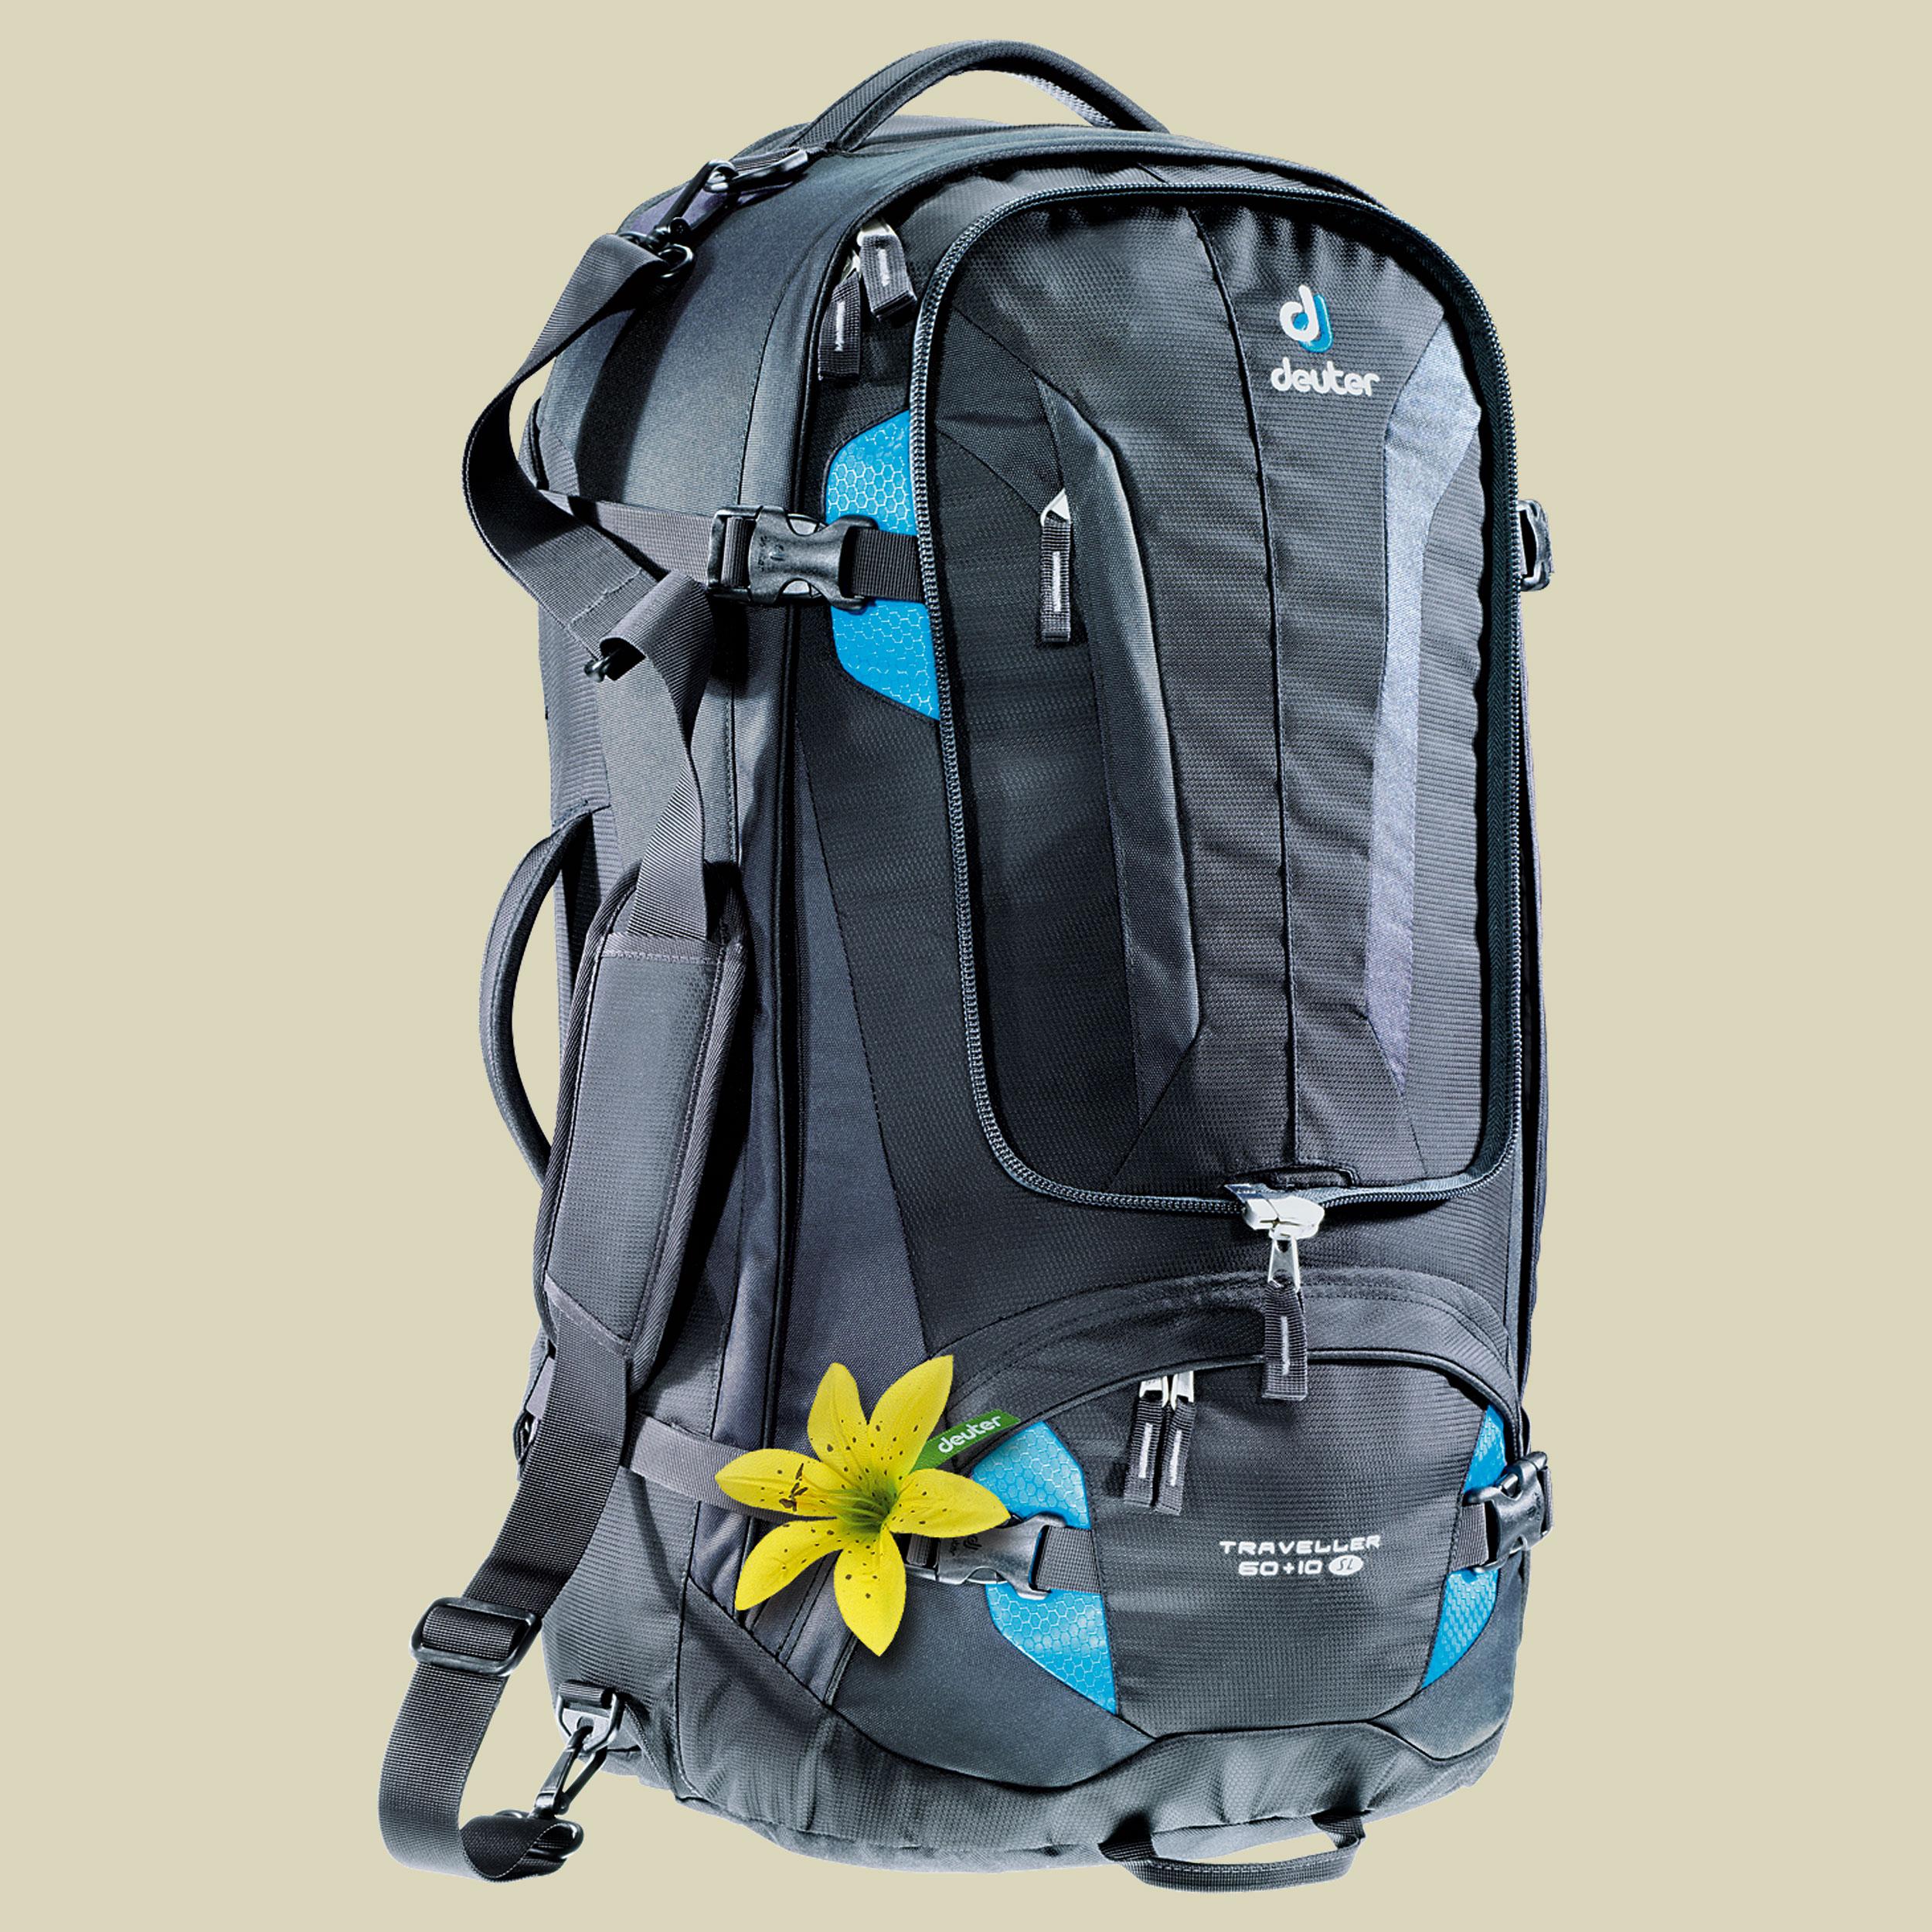 Deuter Traveller 60 + 10 SL Damen Reiserucksack Volumen 60 + 10 L plus 15 L Daypack black-turquoise